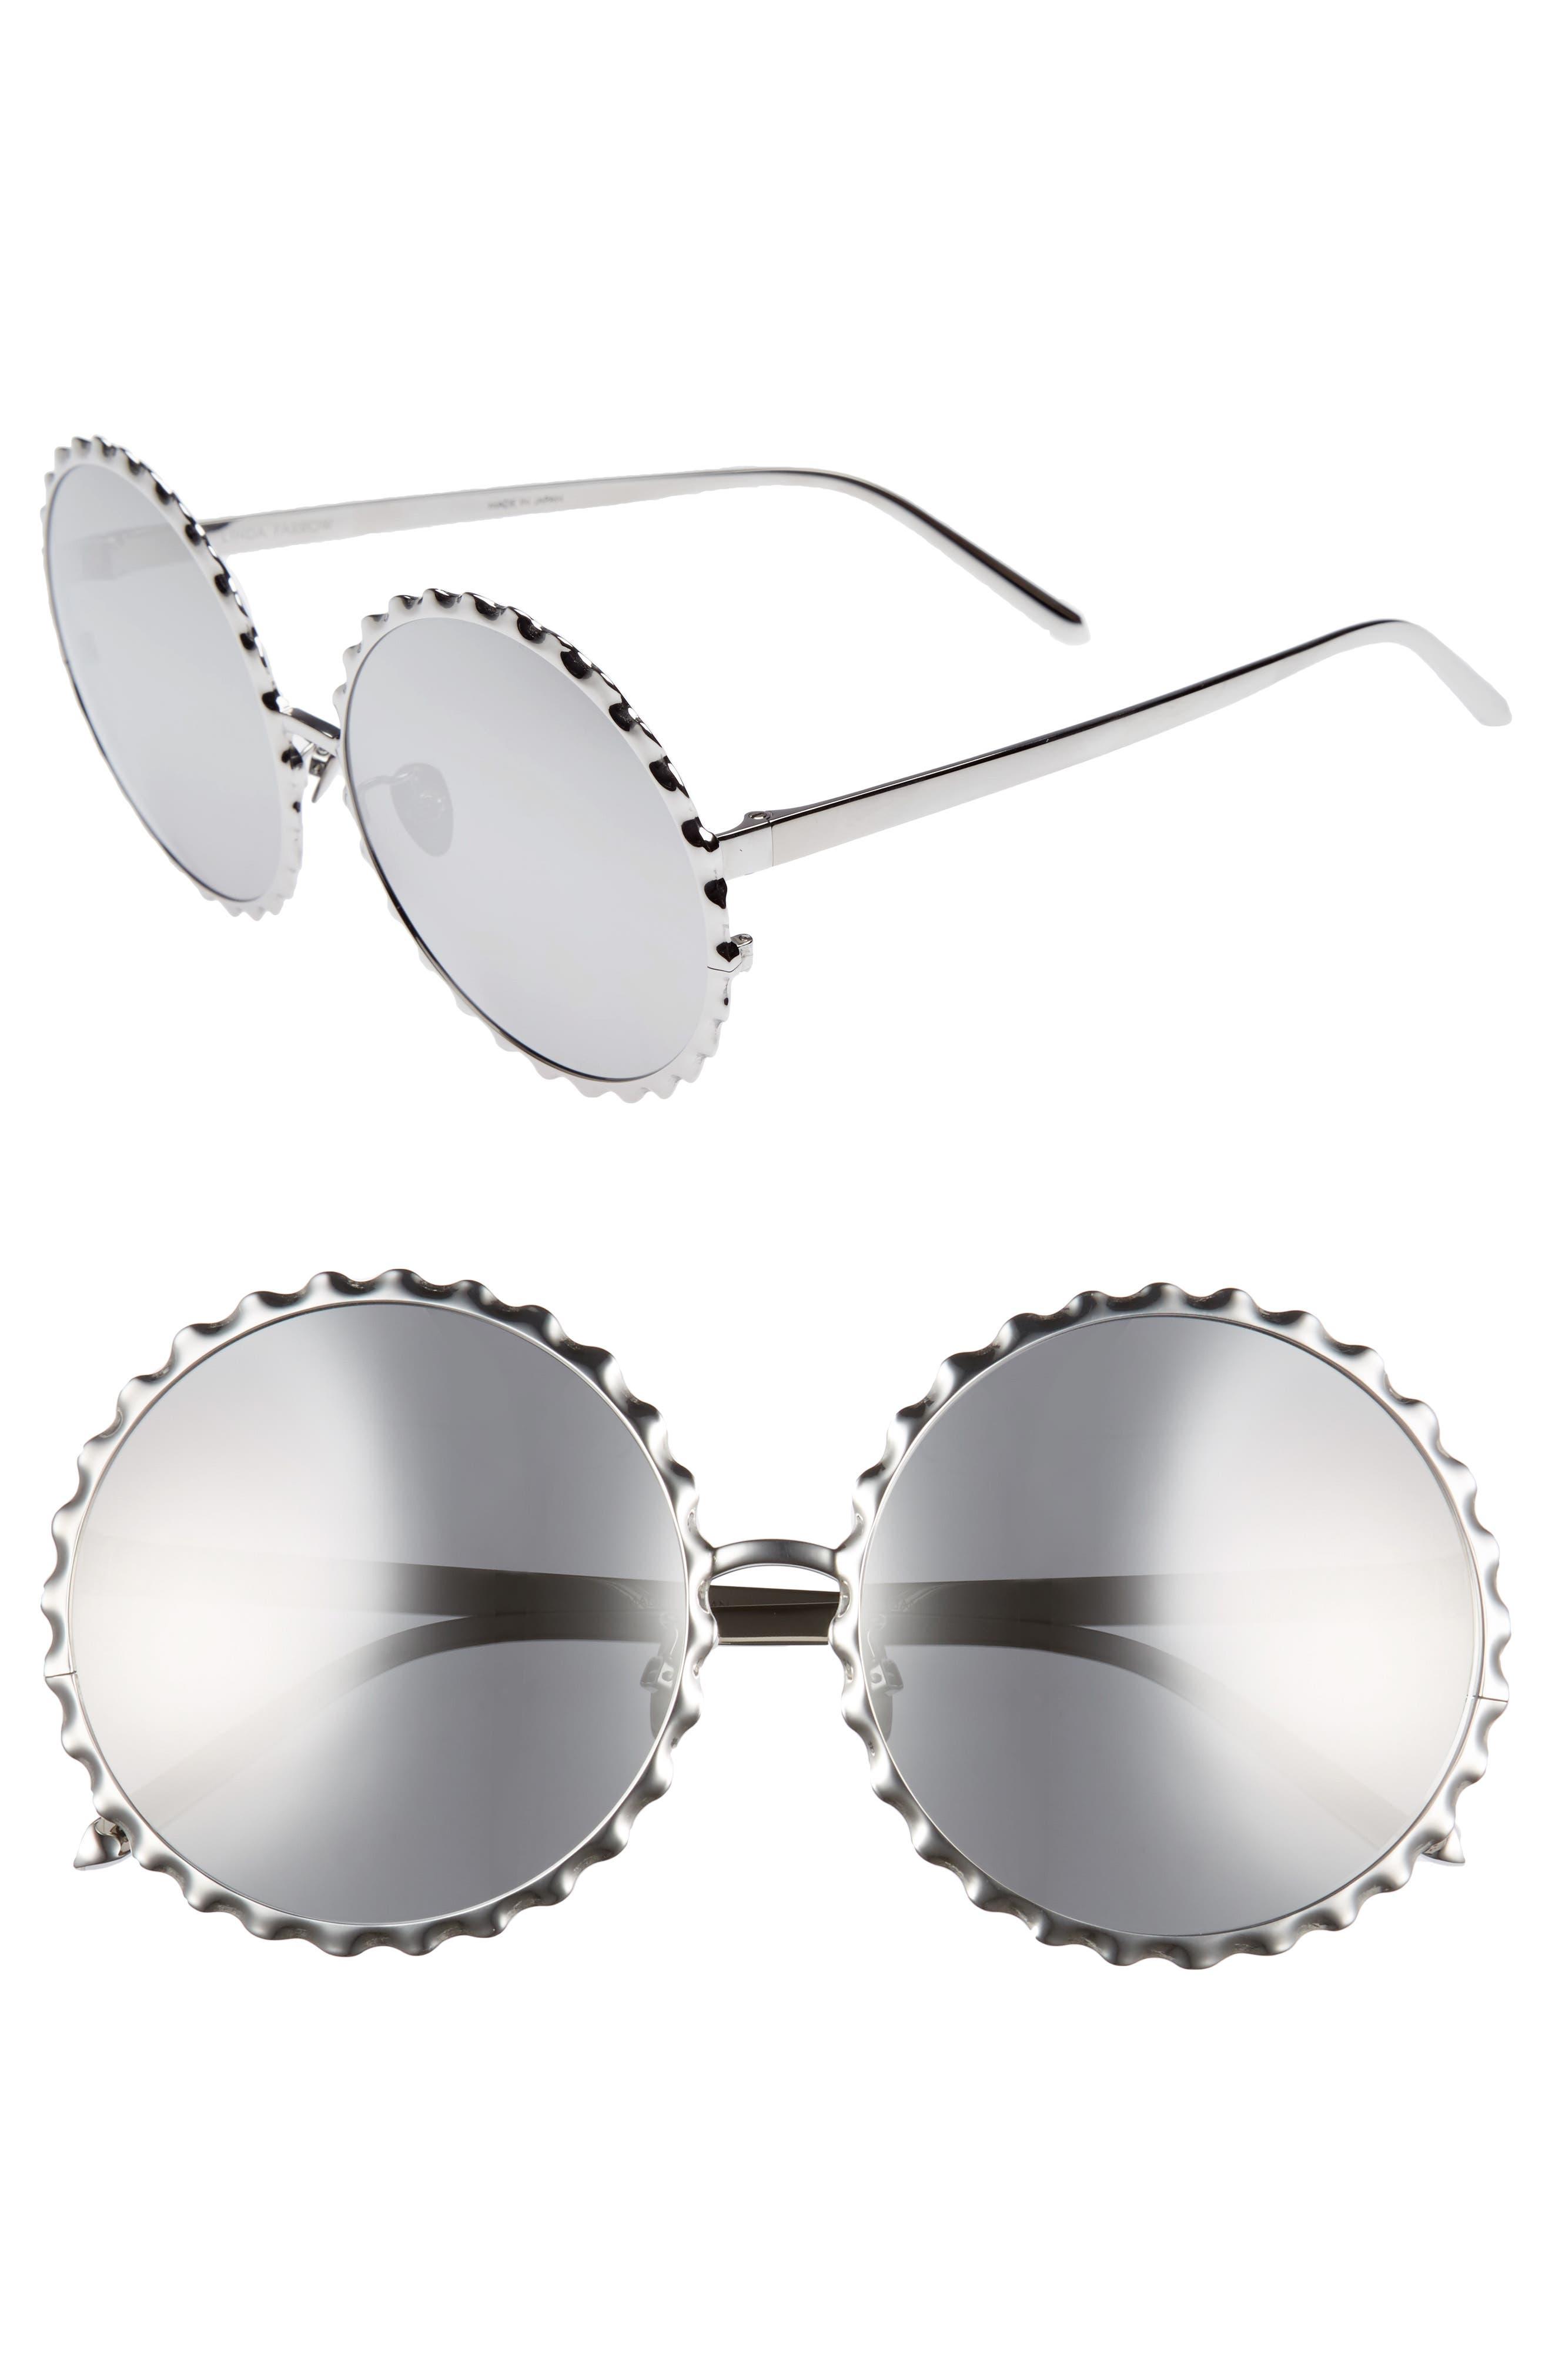 59mm Mirrored 18 Karat Gold Trim Round Sunglasses,                         Main,                         color, White Gold/ Platinum